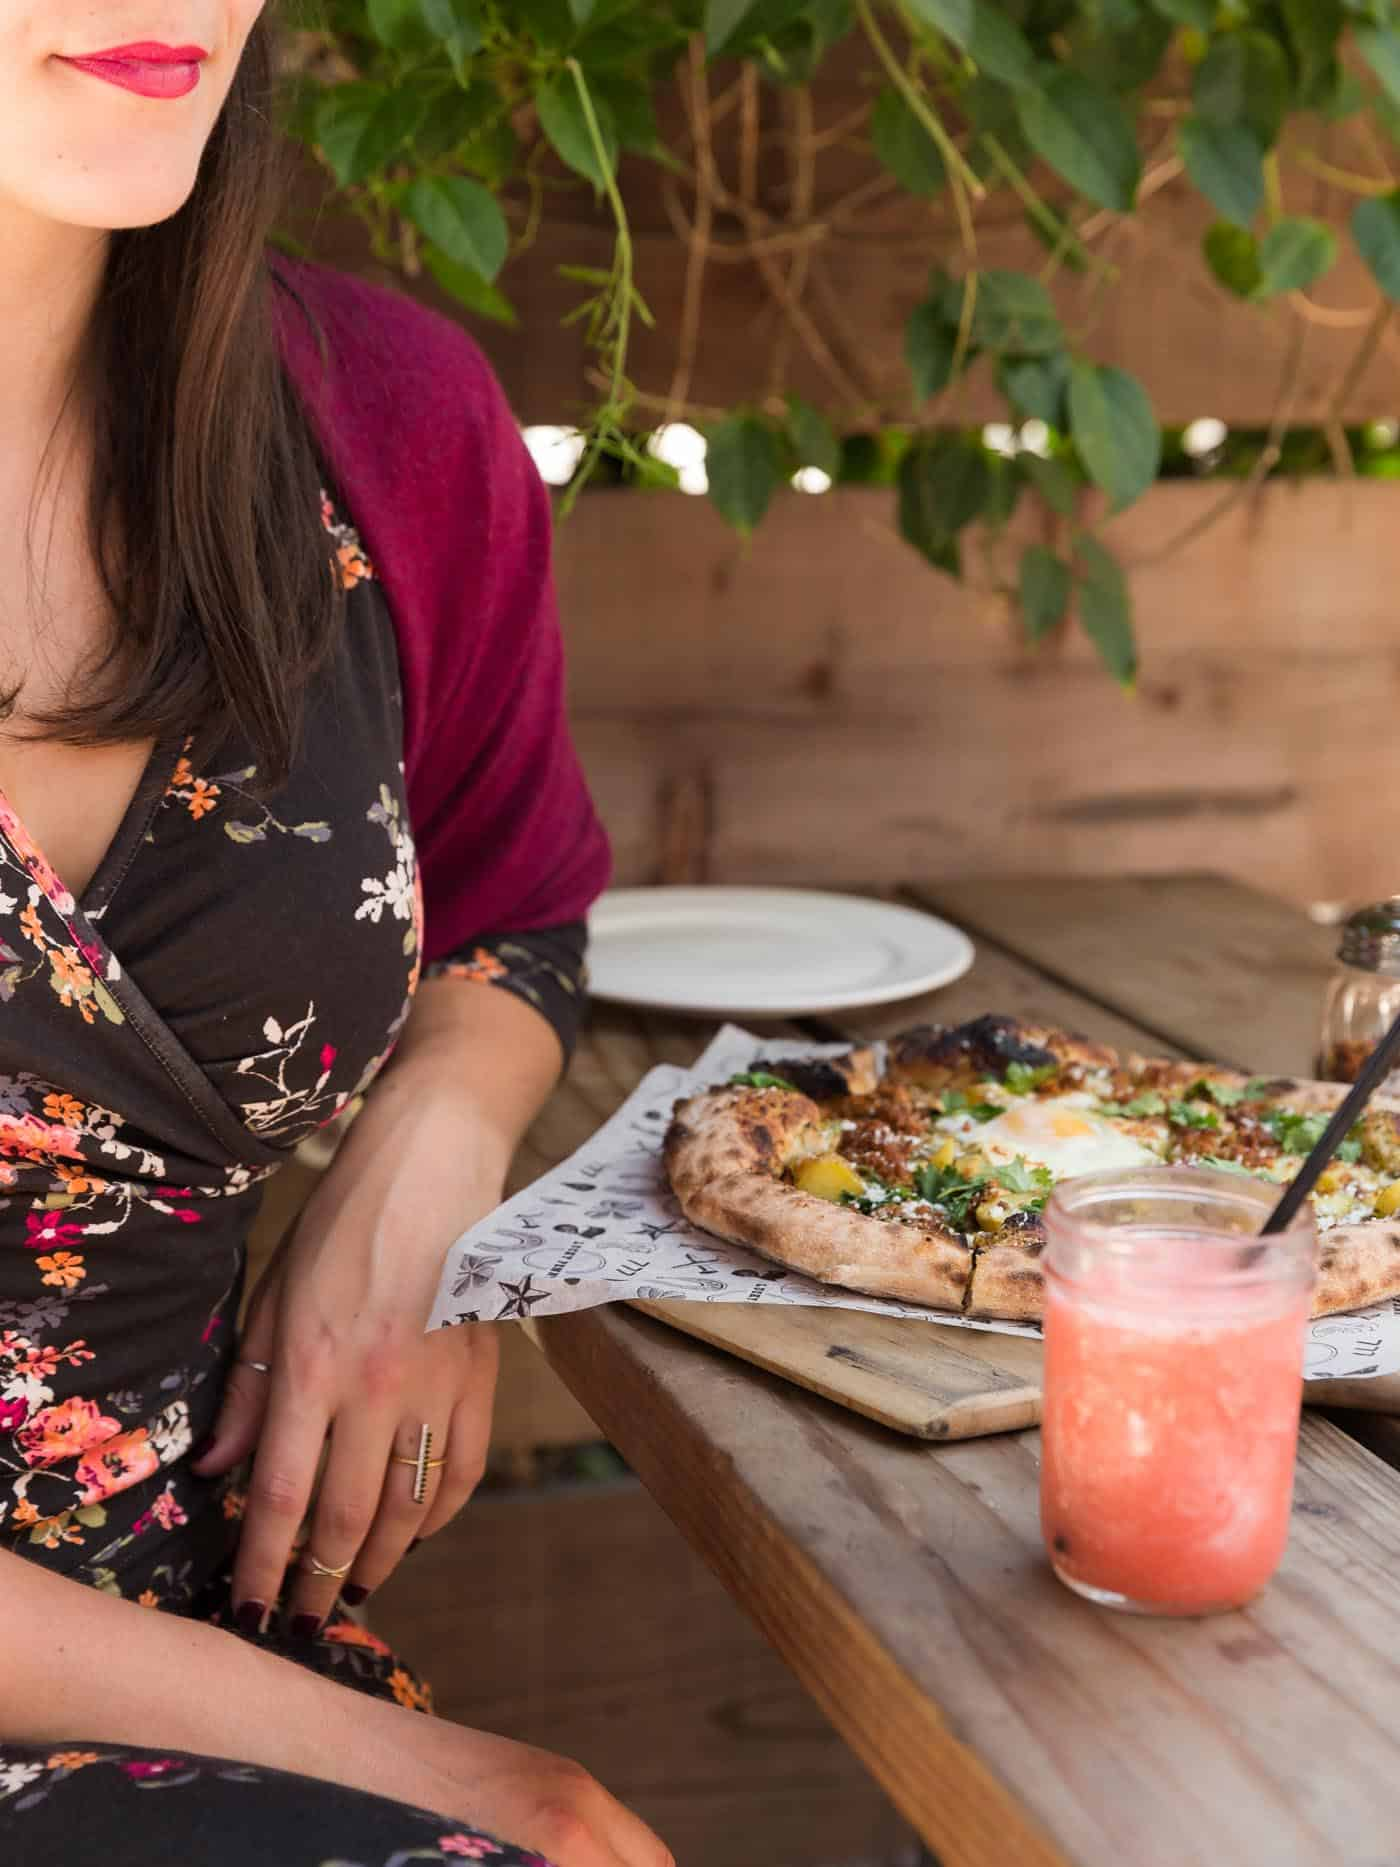 pizza, best pizza in Santa Barbara, Santa Barbara Travel Guide - My Style Vita @mystylevita